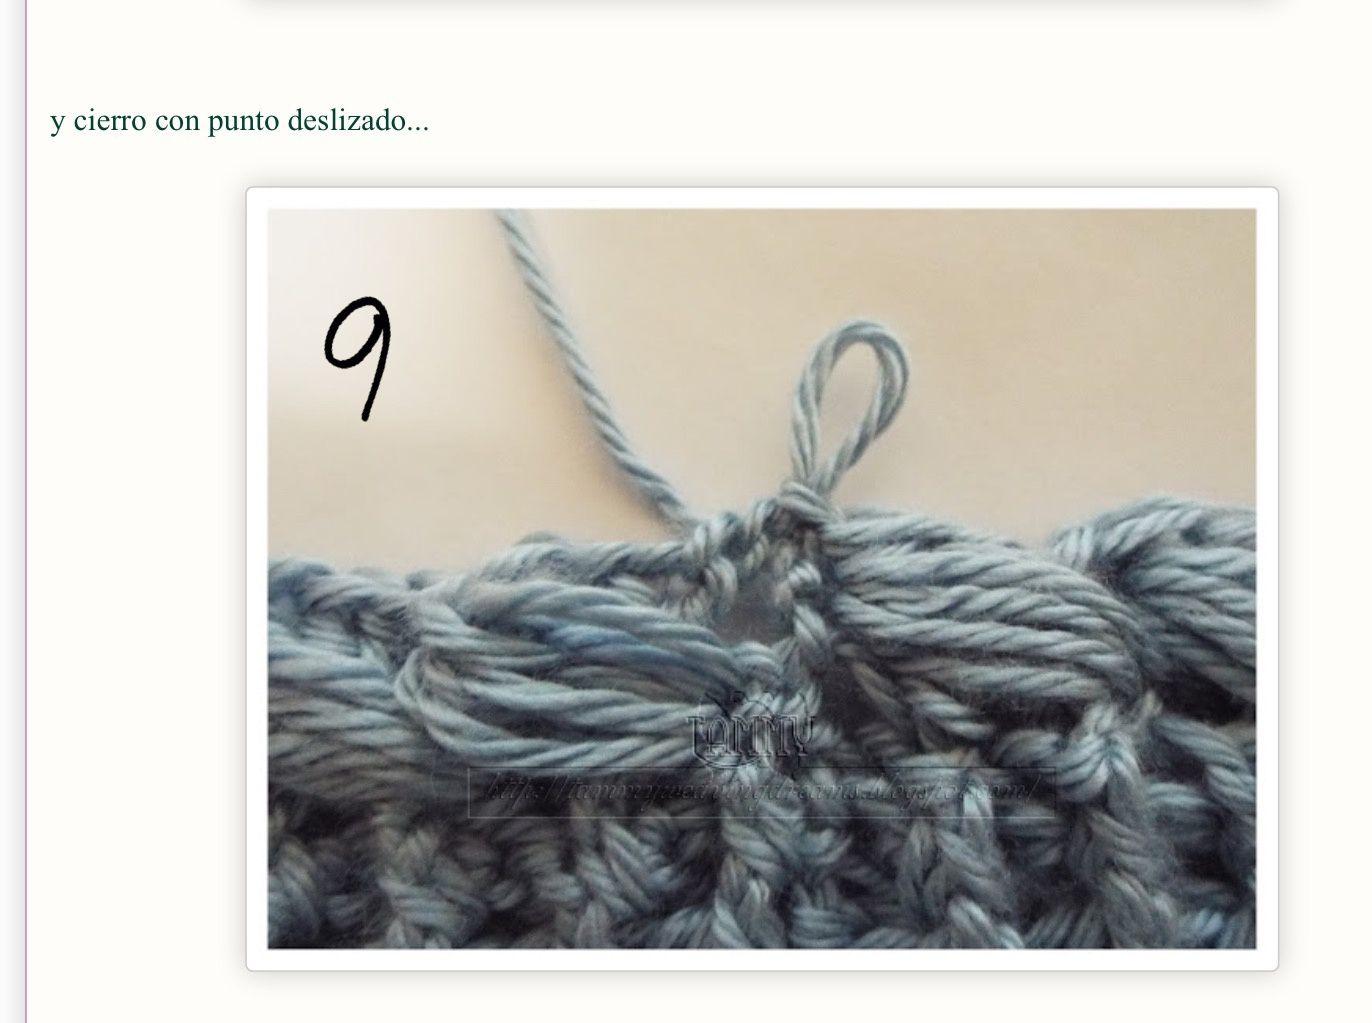 Pin de Paula Ortiz en Gorro Slouchy | Pinterest